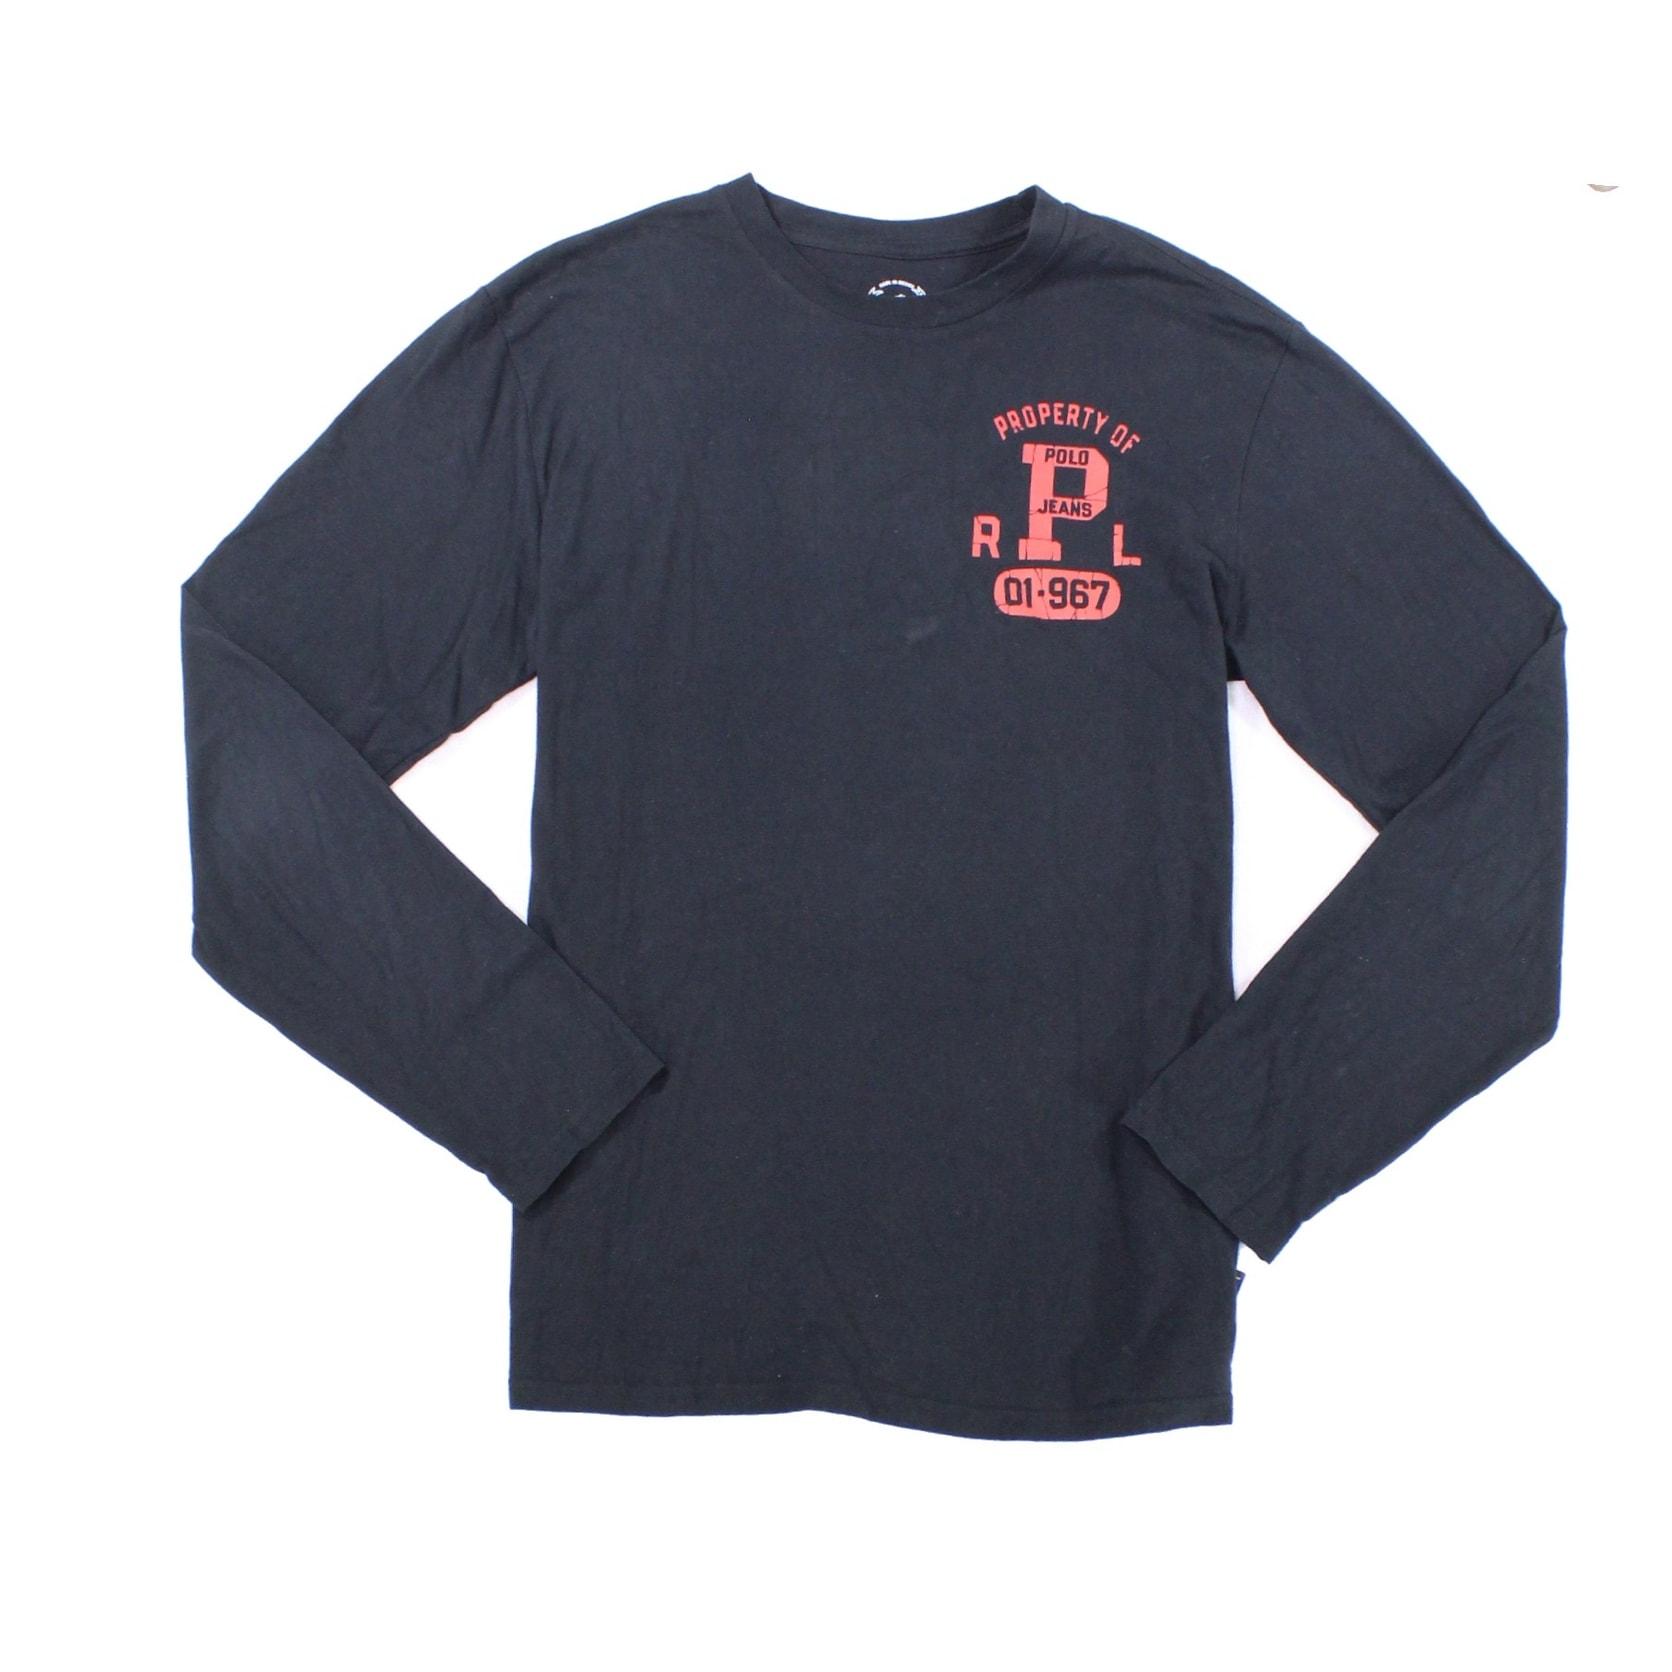 359d1c735a ... reduced shop polo ralph lauren new black mens size medium m property of  polo t shirt